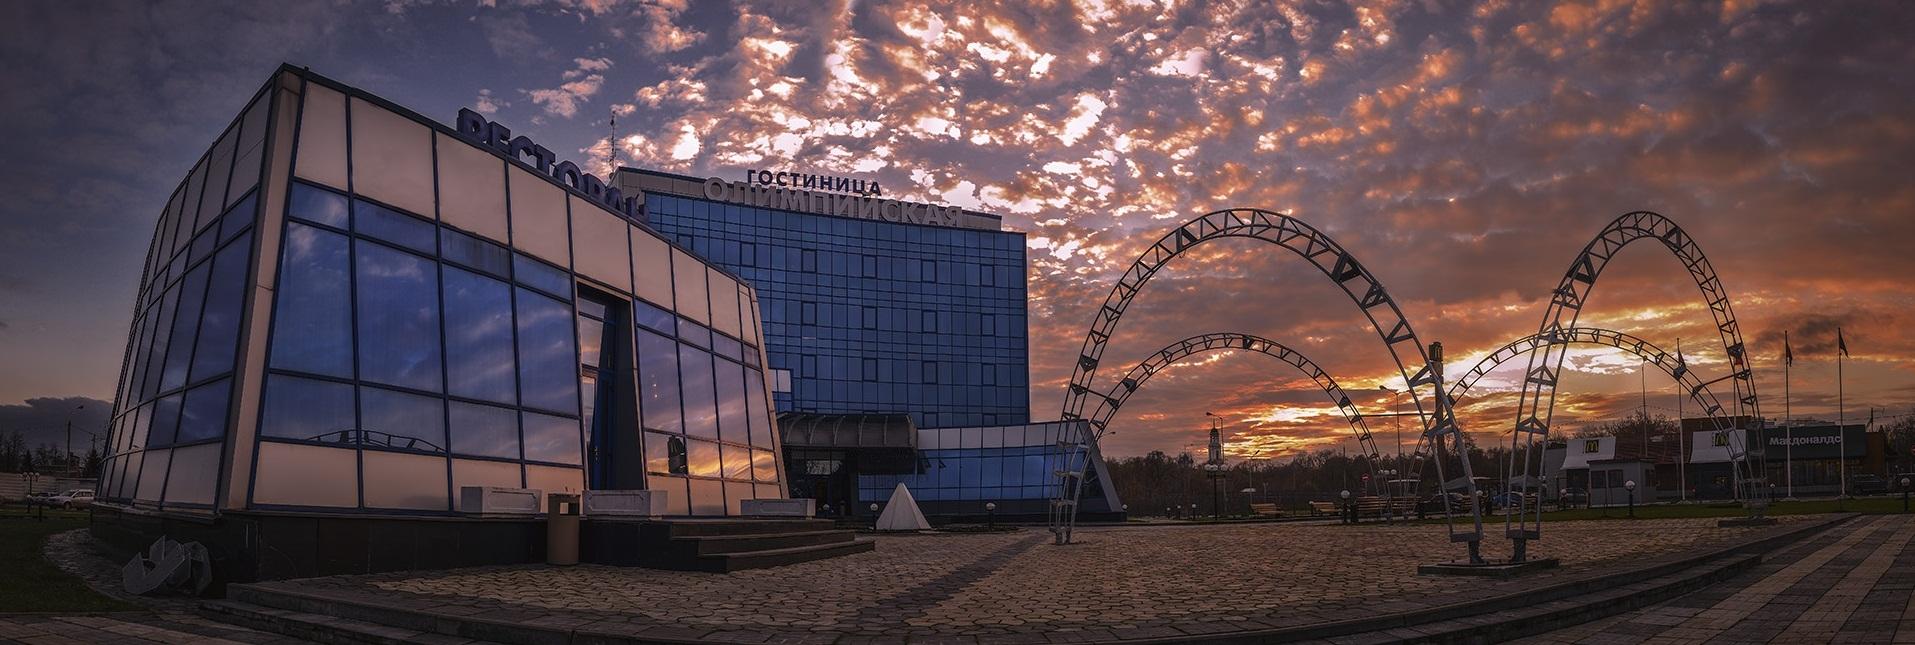 Грузоперевозки из Чехова в Москву